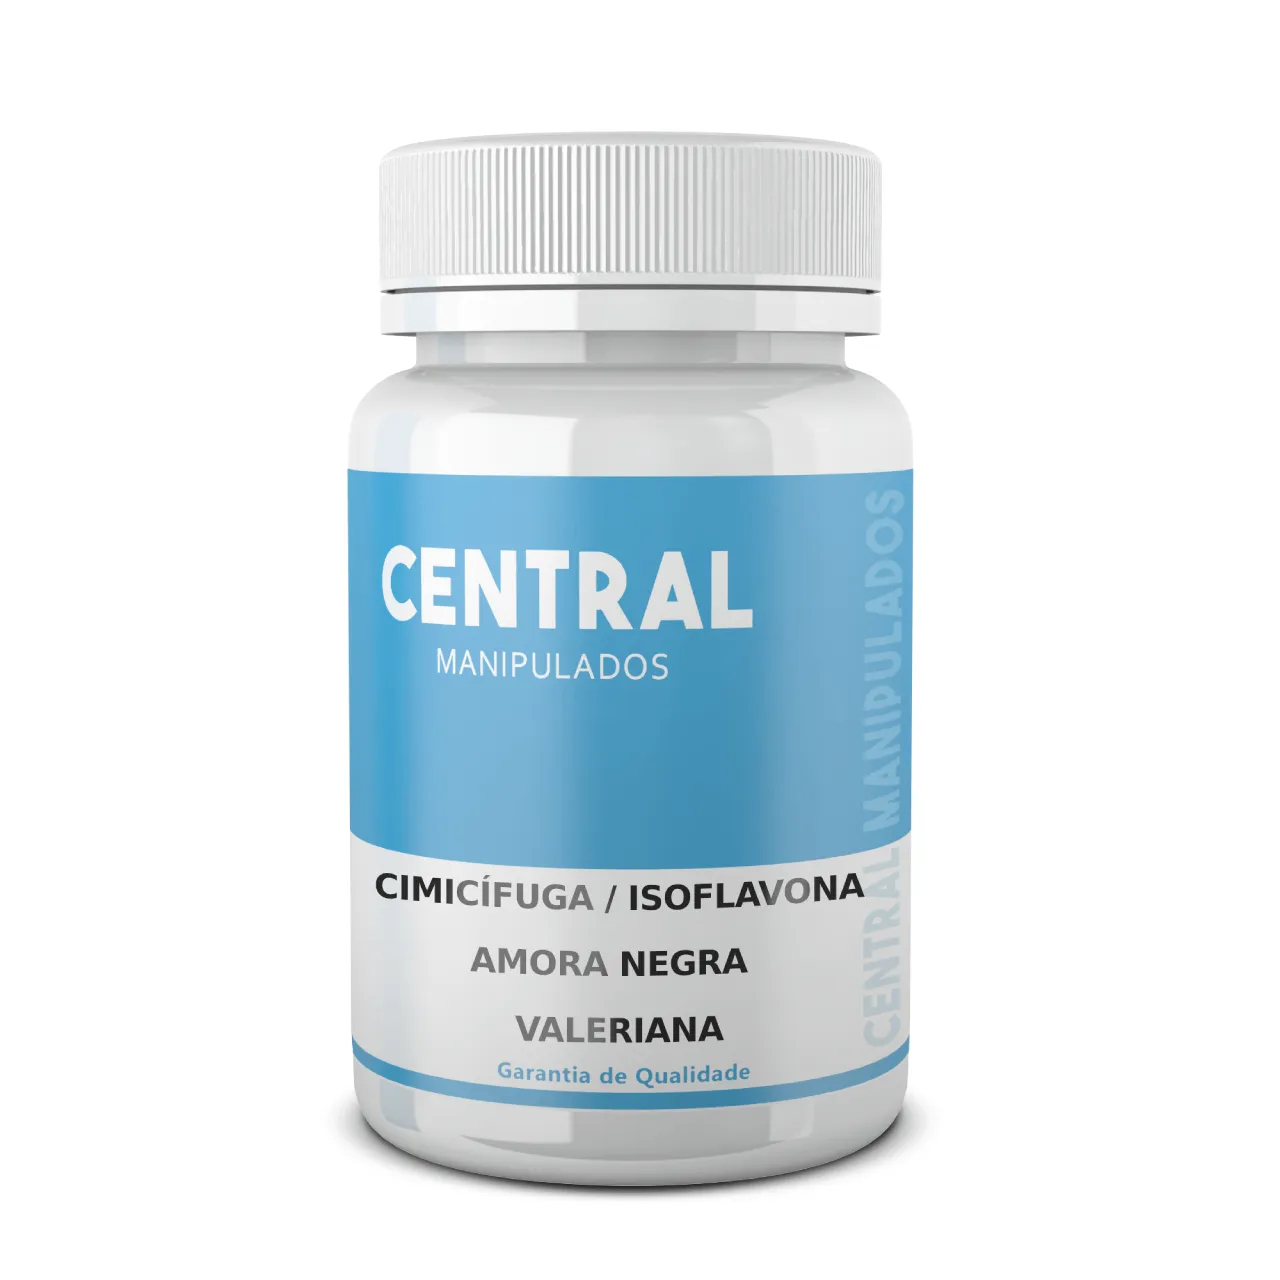 Cimicifuga 40mg + Isoflavona 50mg + Amora Negra 300mg + Valeriana 100mg - 60 Cápsulas - Composto para Menopausa